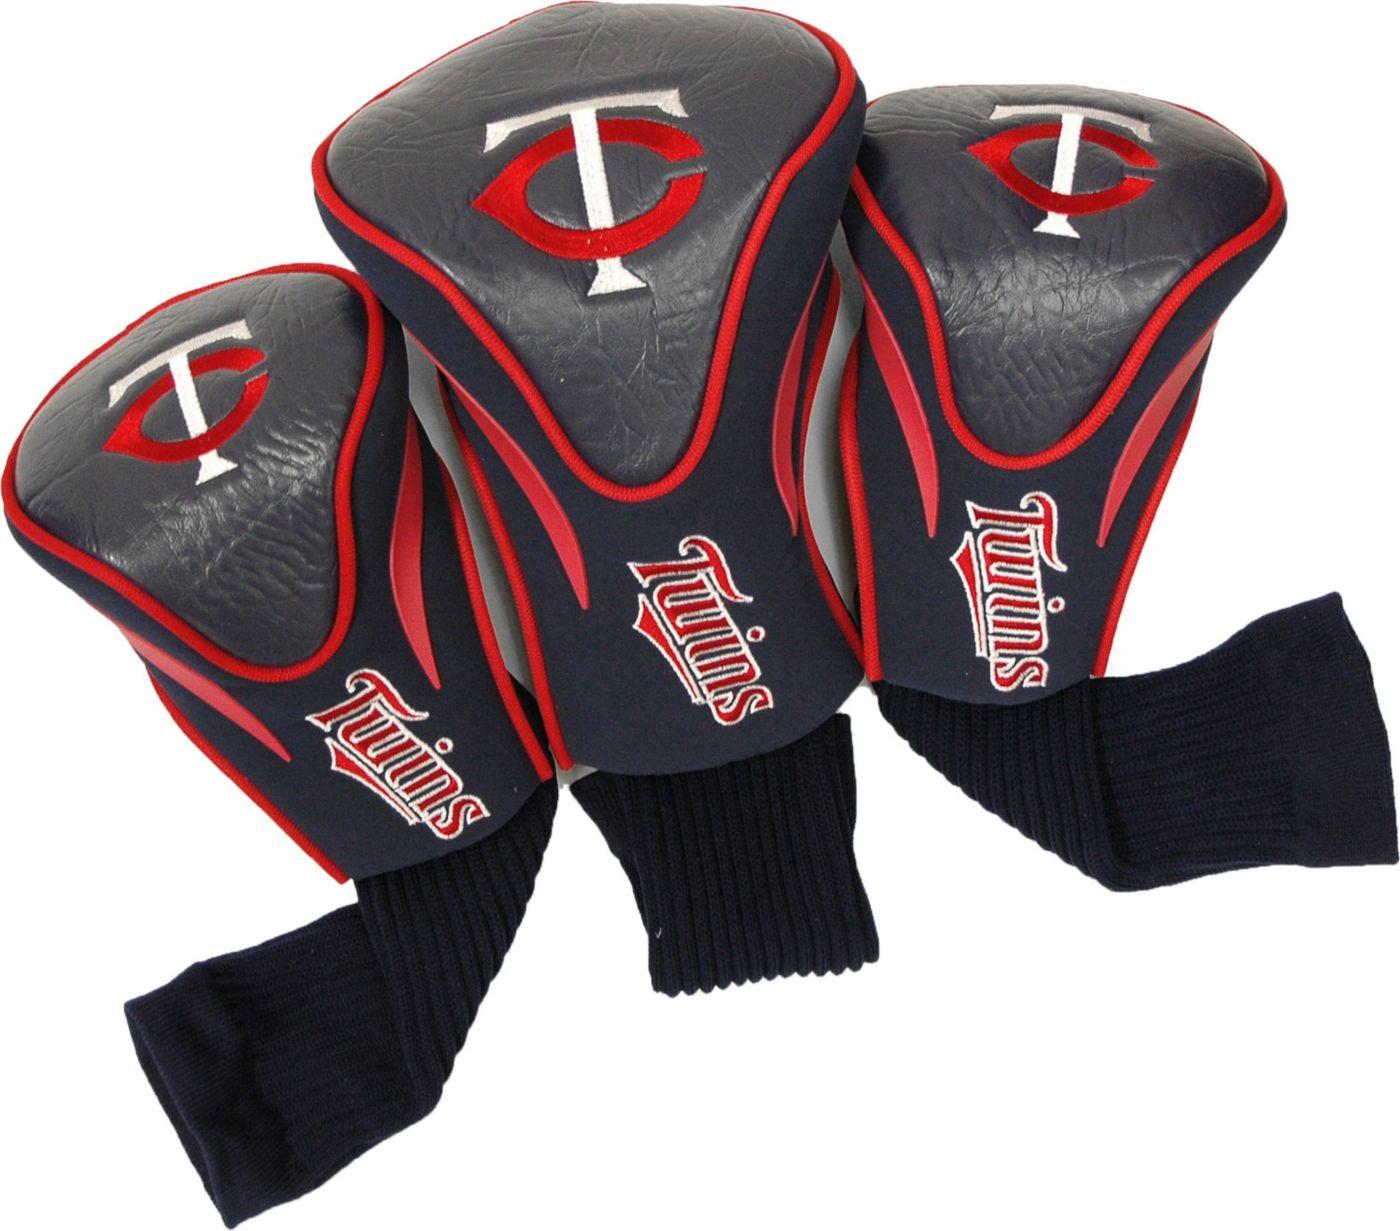 Team Golf Minnesota Twins Contour Sock Headcovers - 3 Pack